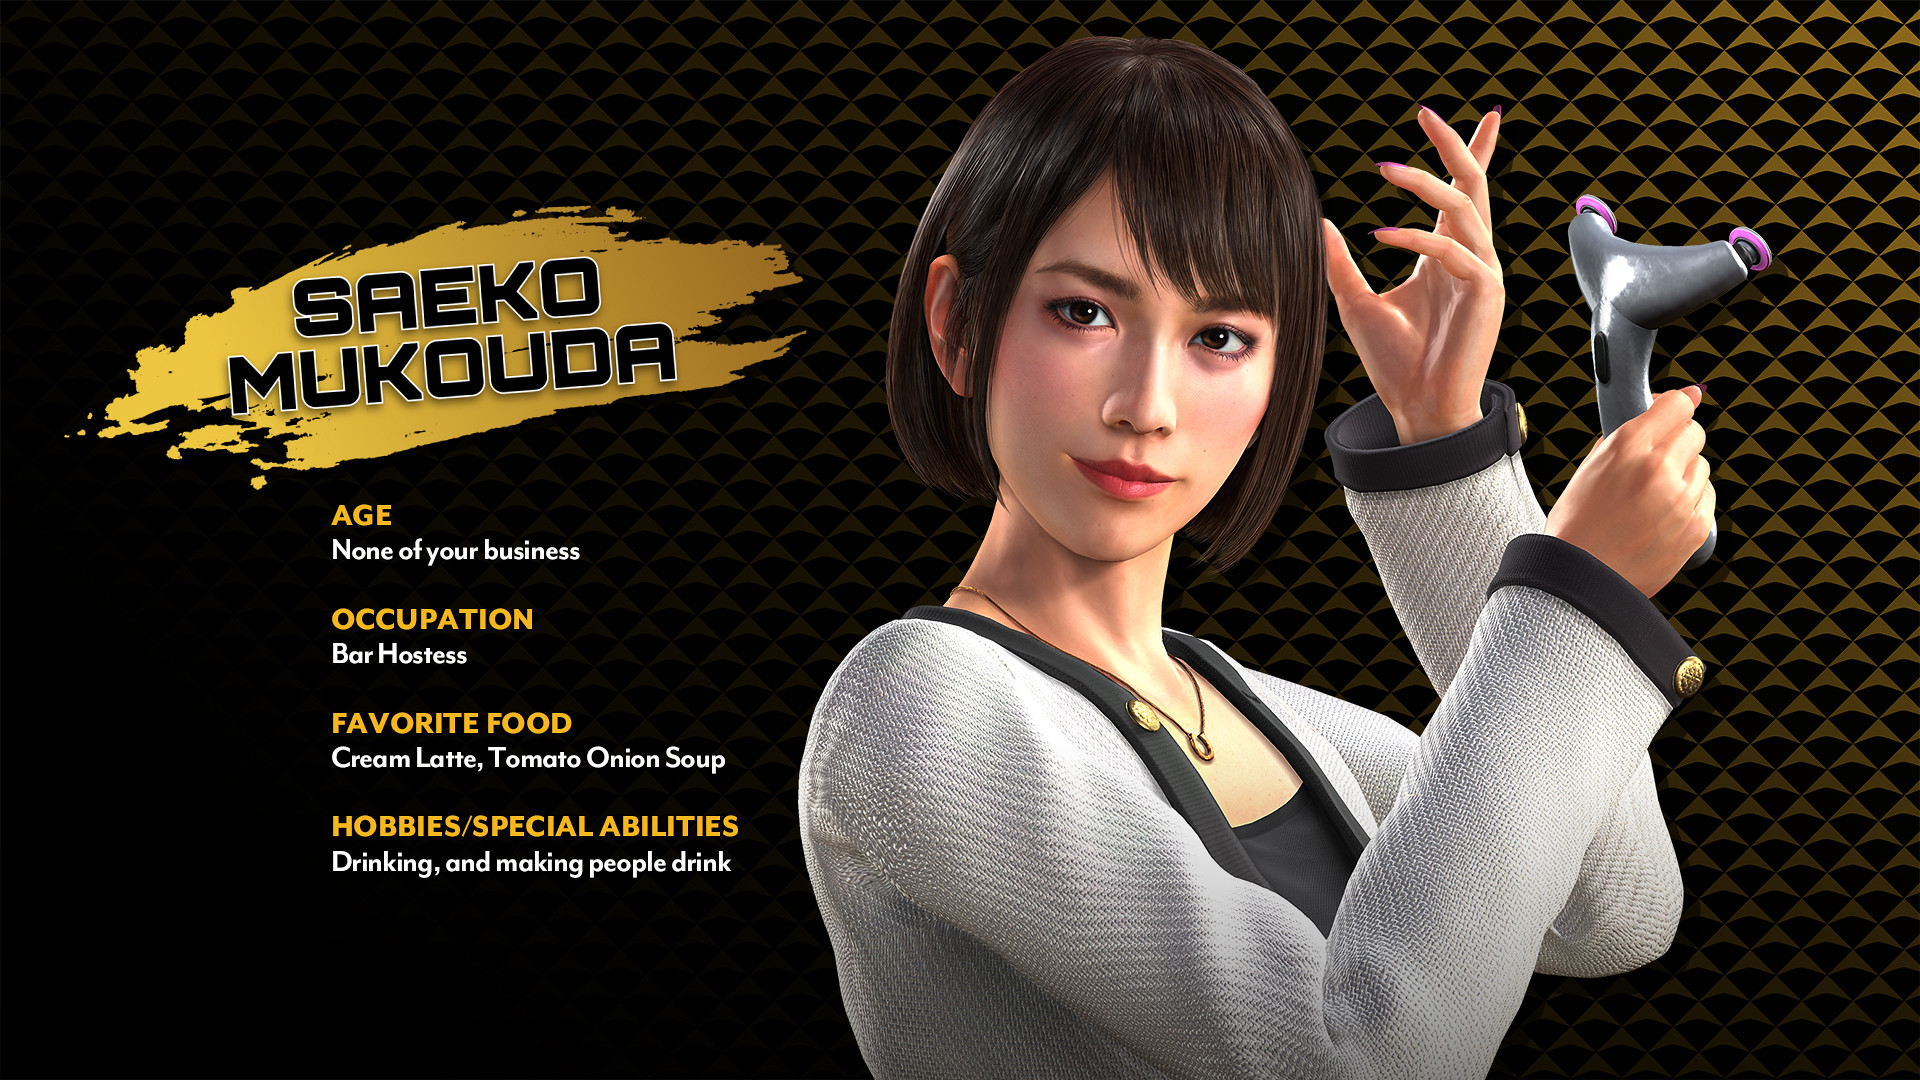 Yakuza Like A Dragon Meet The Heroes Of Tomorrow Playstation Blog